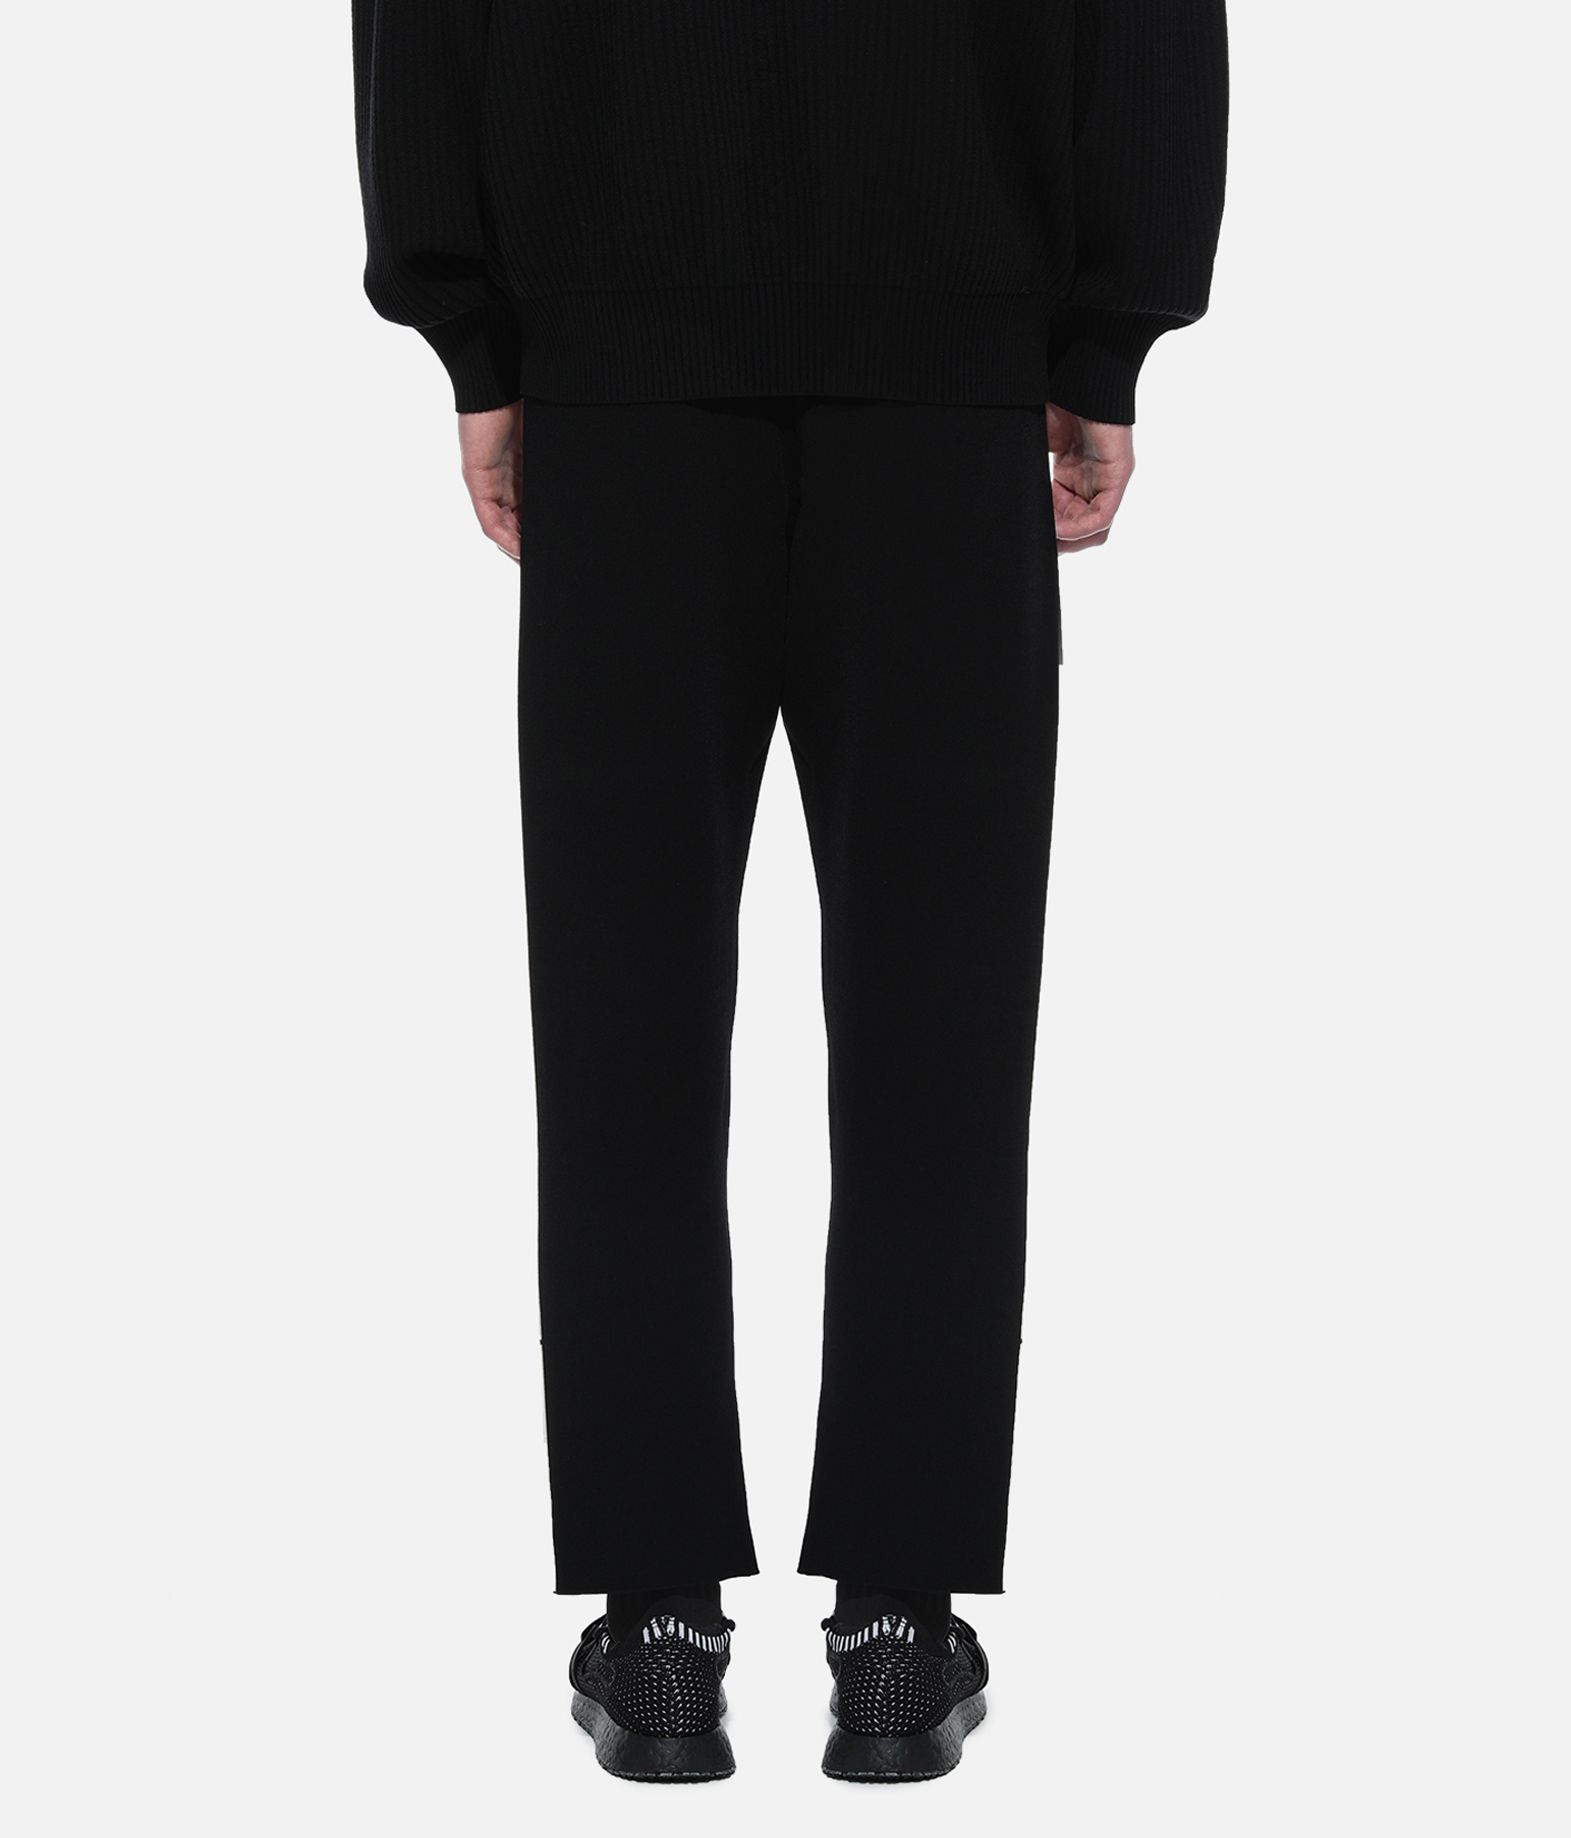 Y-3 Y-3 Tech Knit Wide Pants Casual pants Man d